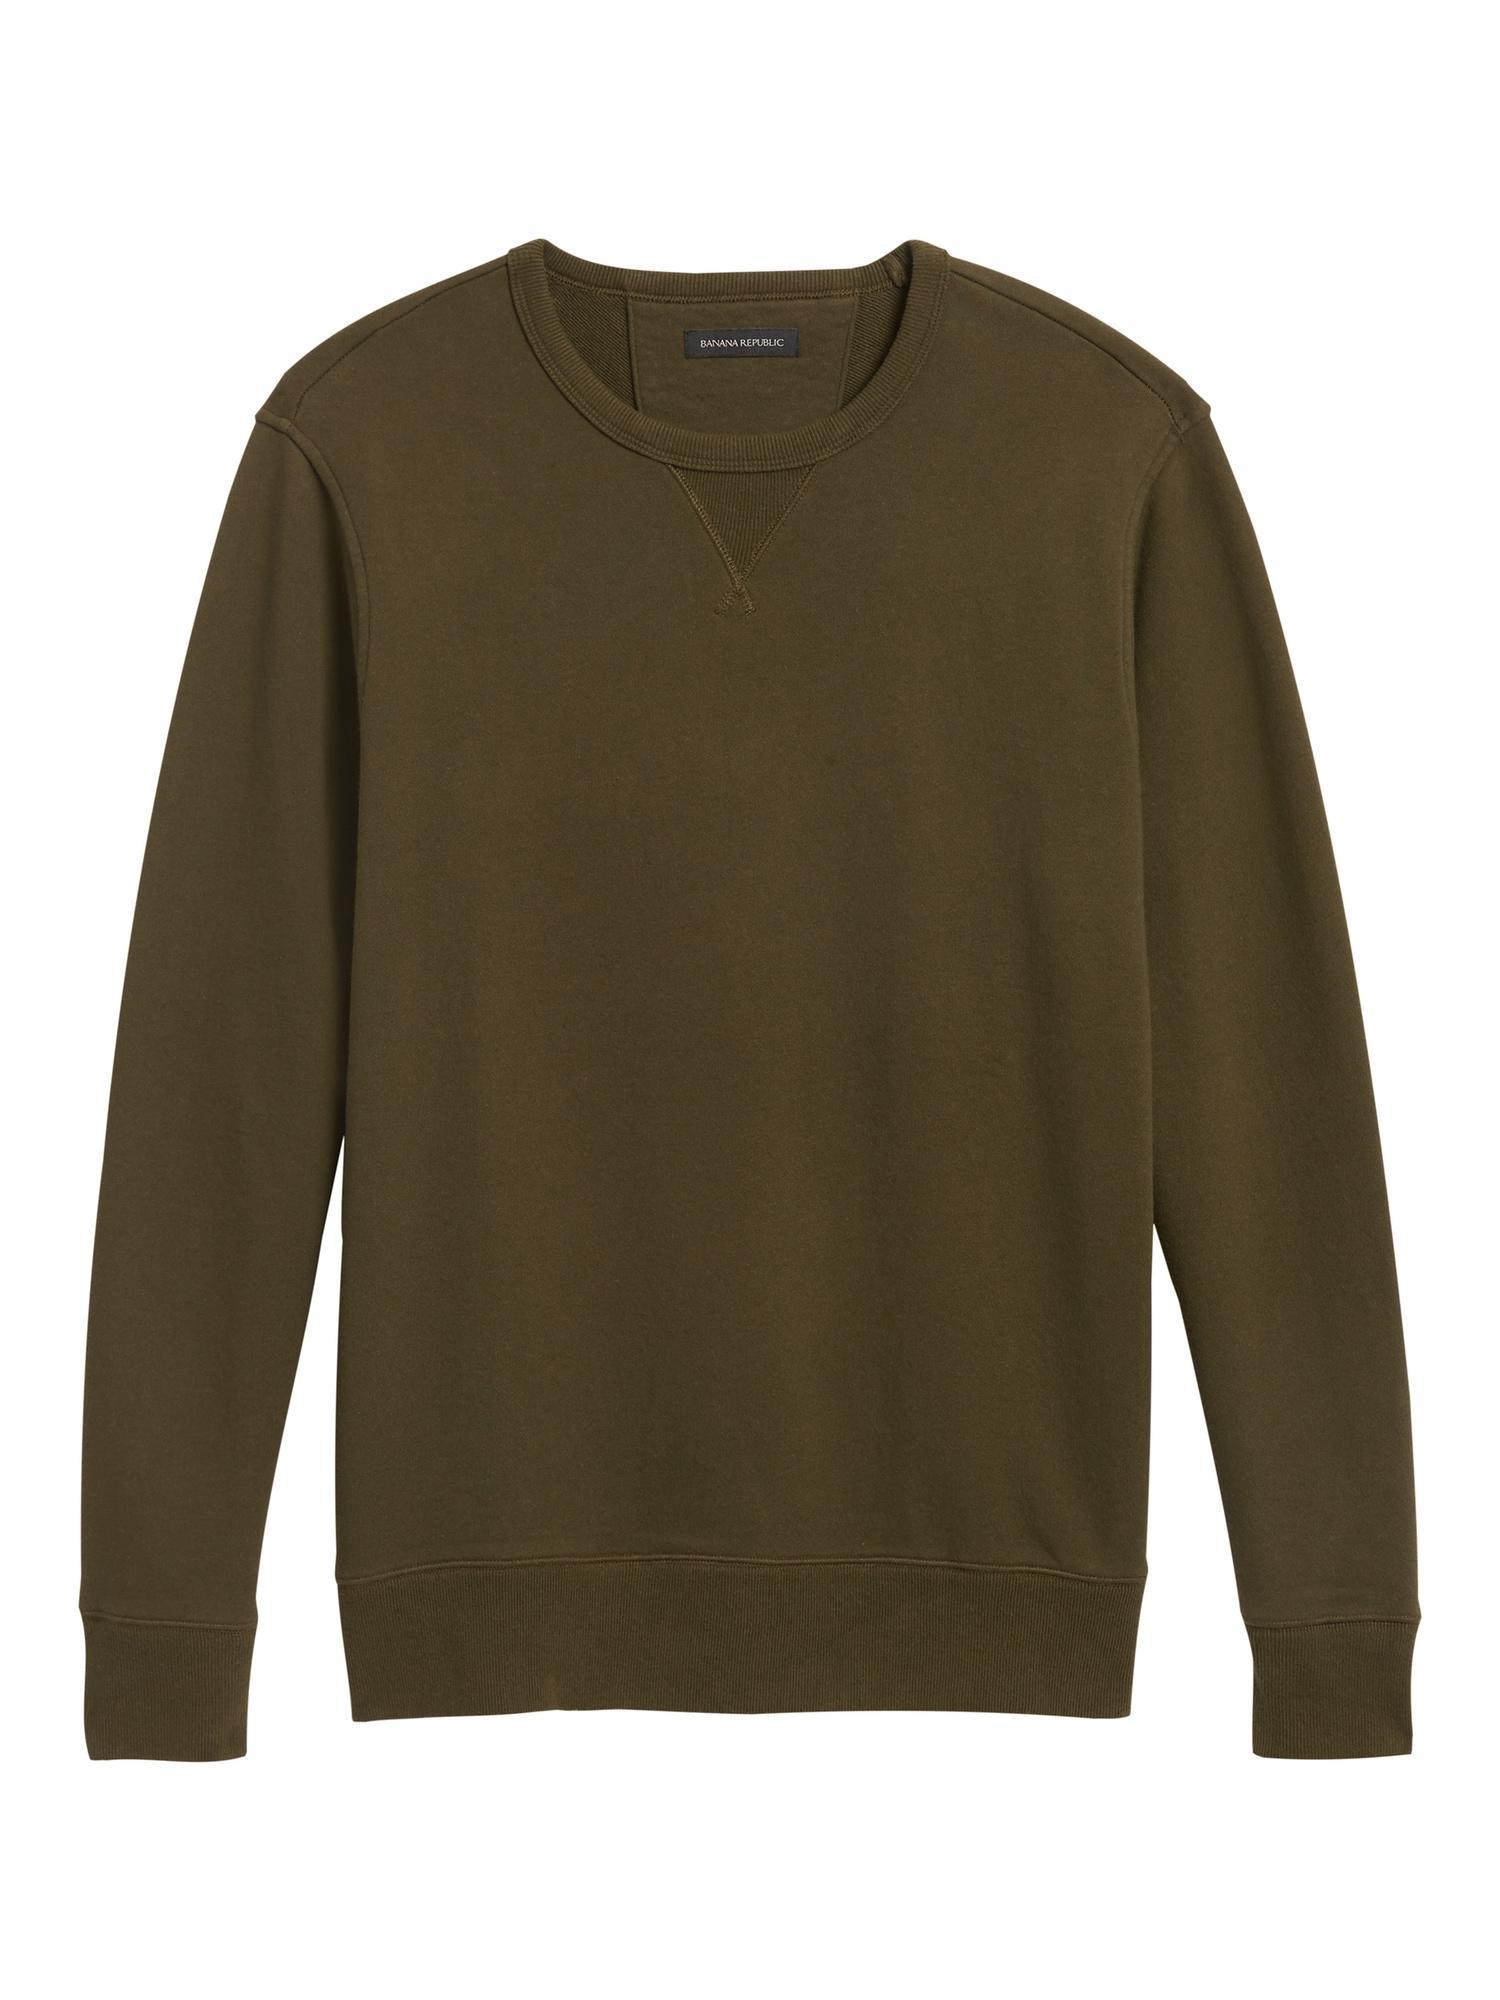 Banana Republic Terry Crew Sweatshirt Lined Green